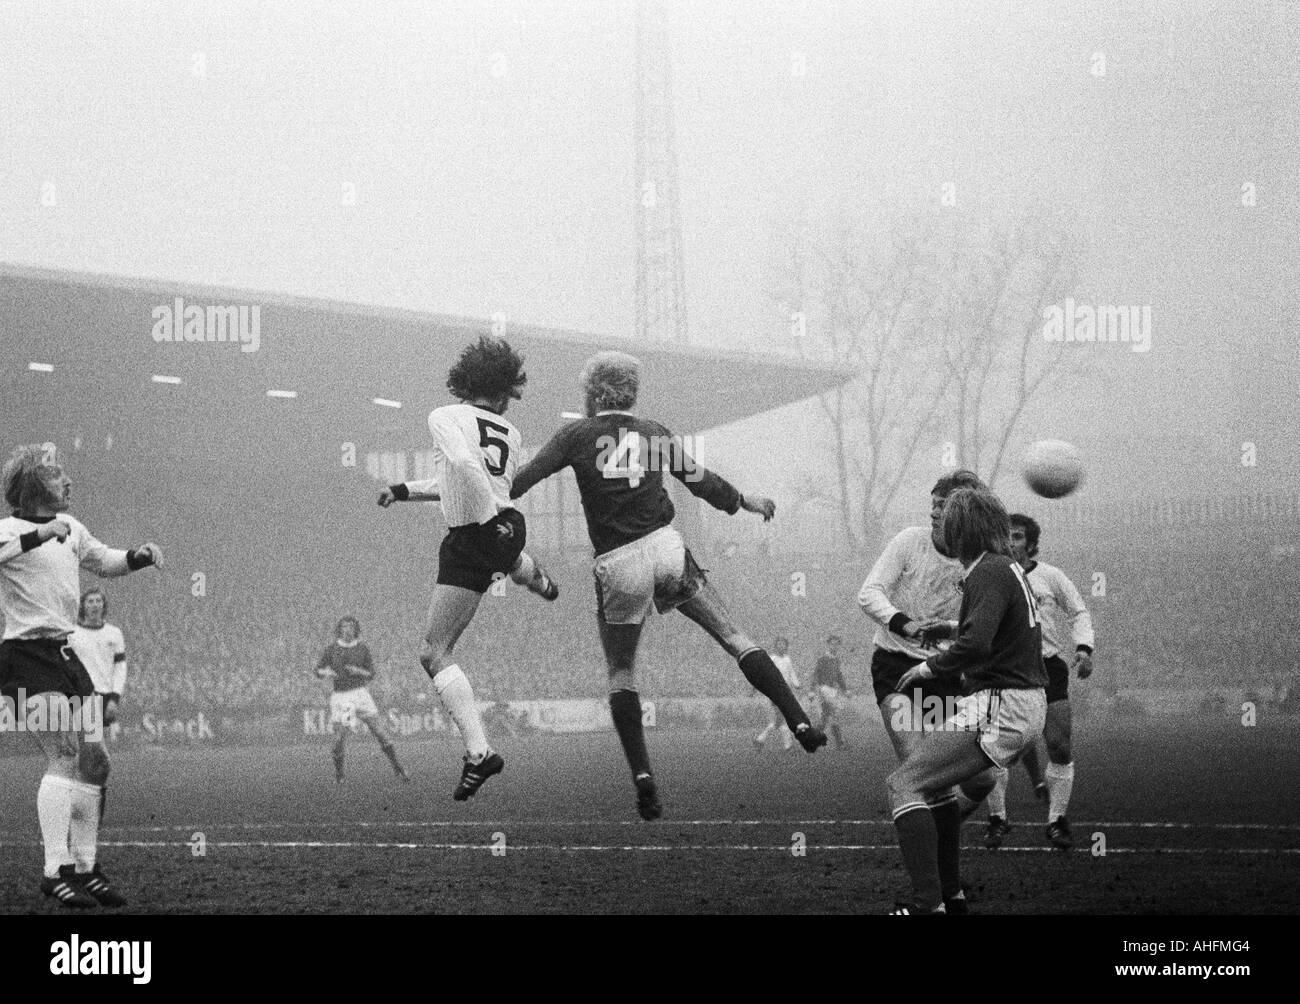 football, Bundesliga, 1971/1972, FC Schalke 04 versus Eintracht Frankfurt 2:0, Glueckaufkampfbahn Stadium in Gelsenkirchen, scene of the match, left Horst Heese (Frankfurt), in the middle Rolf Ruessmann (S04, 4) - Stock Image